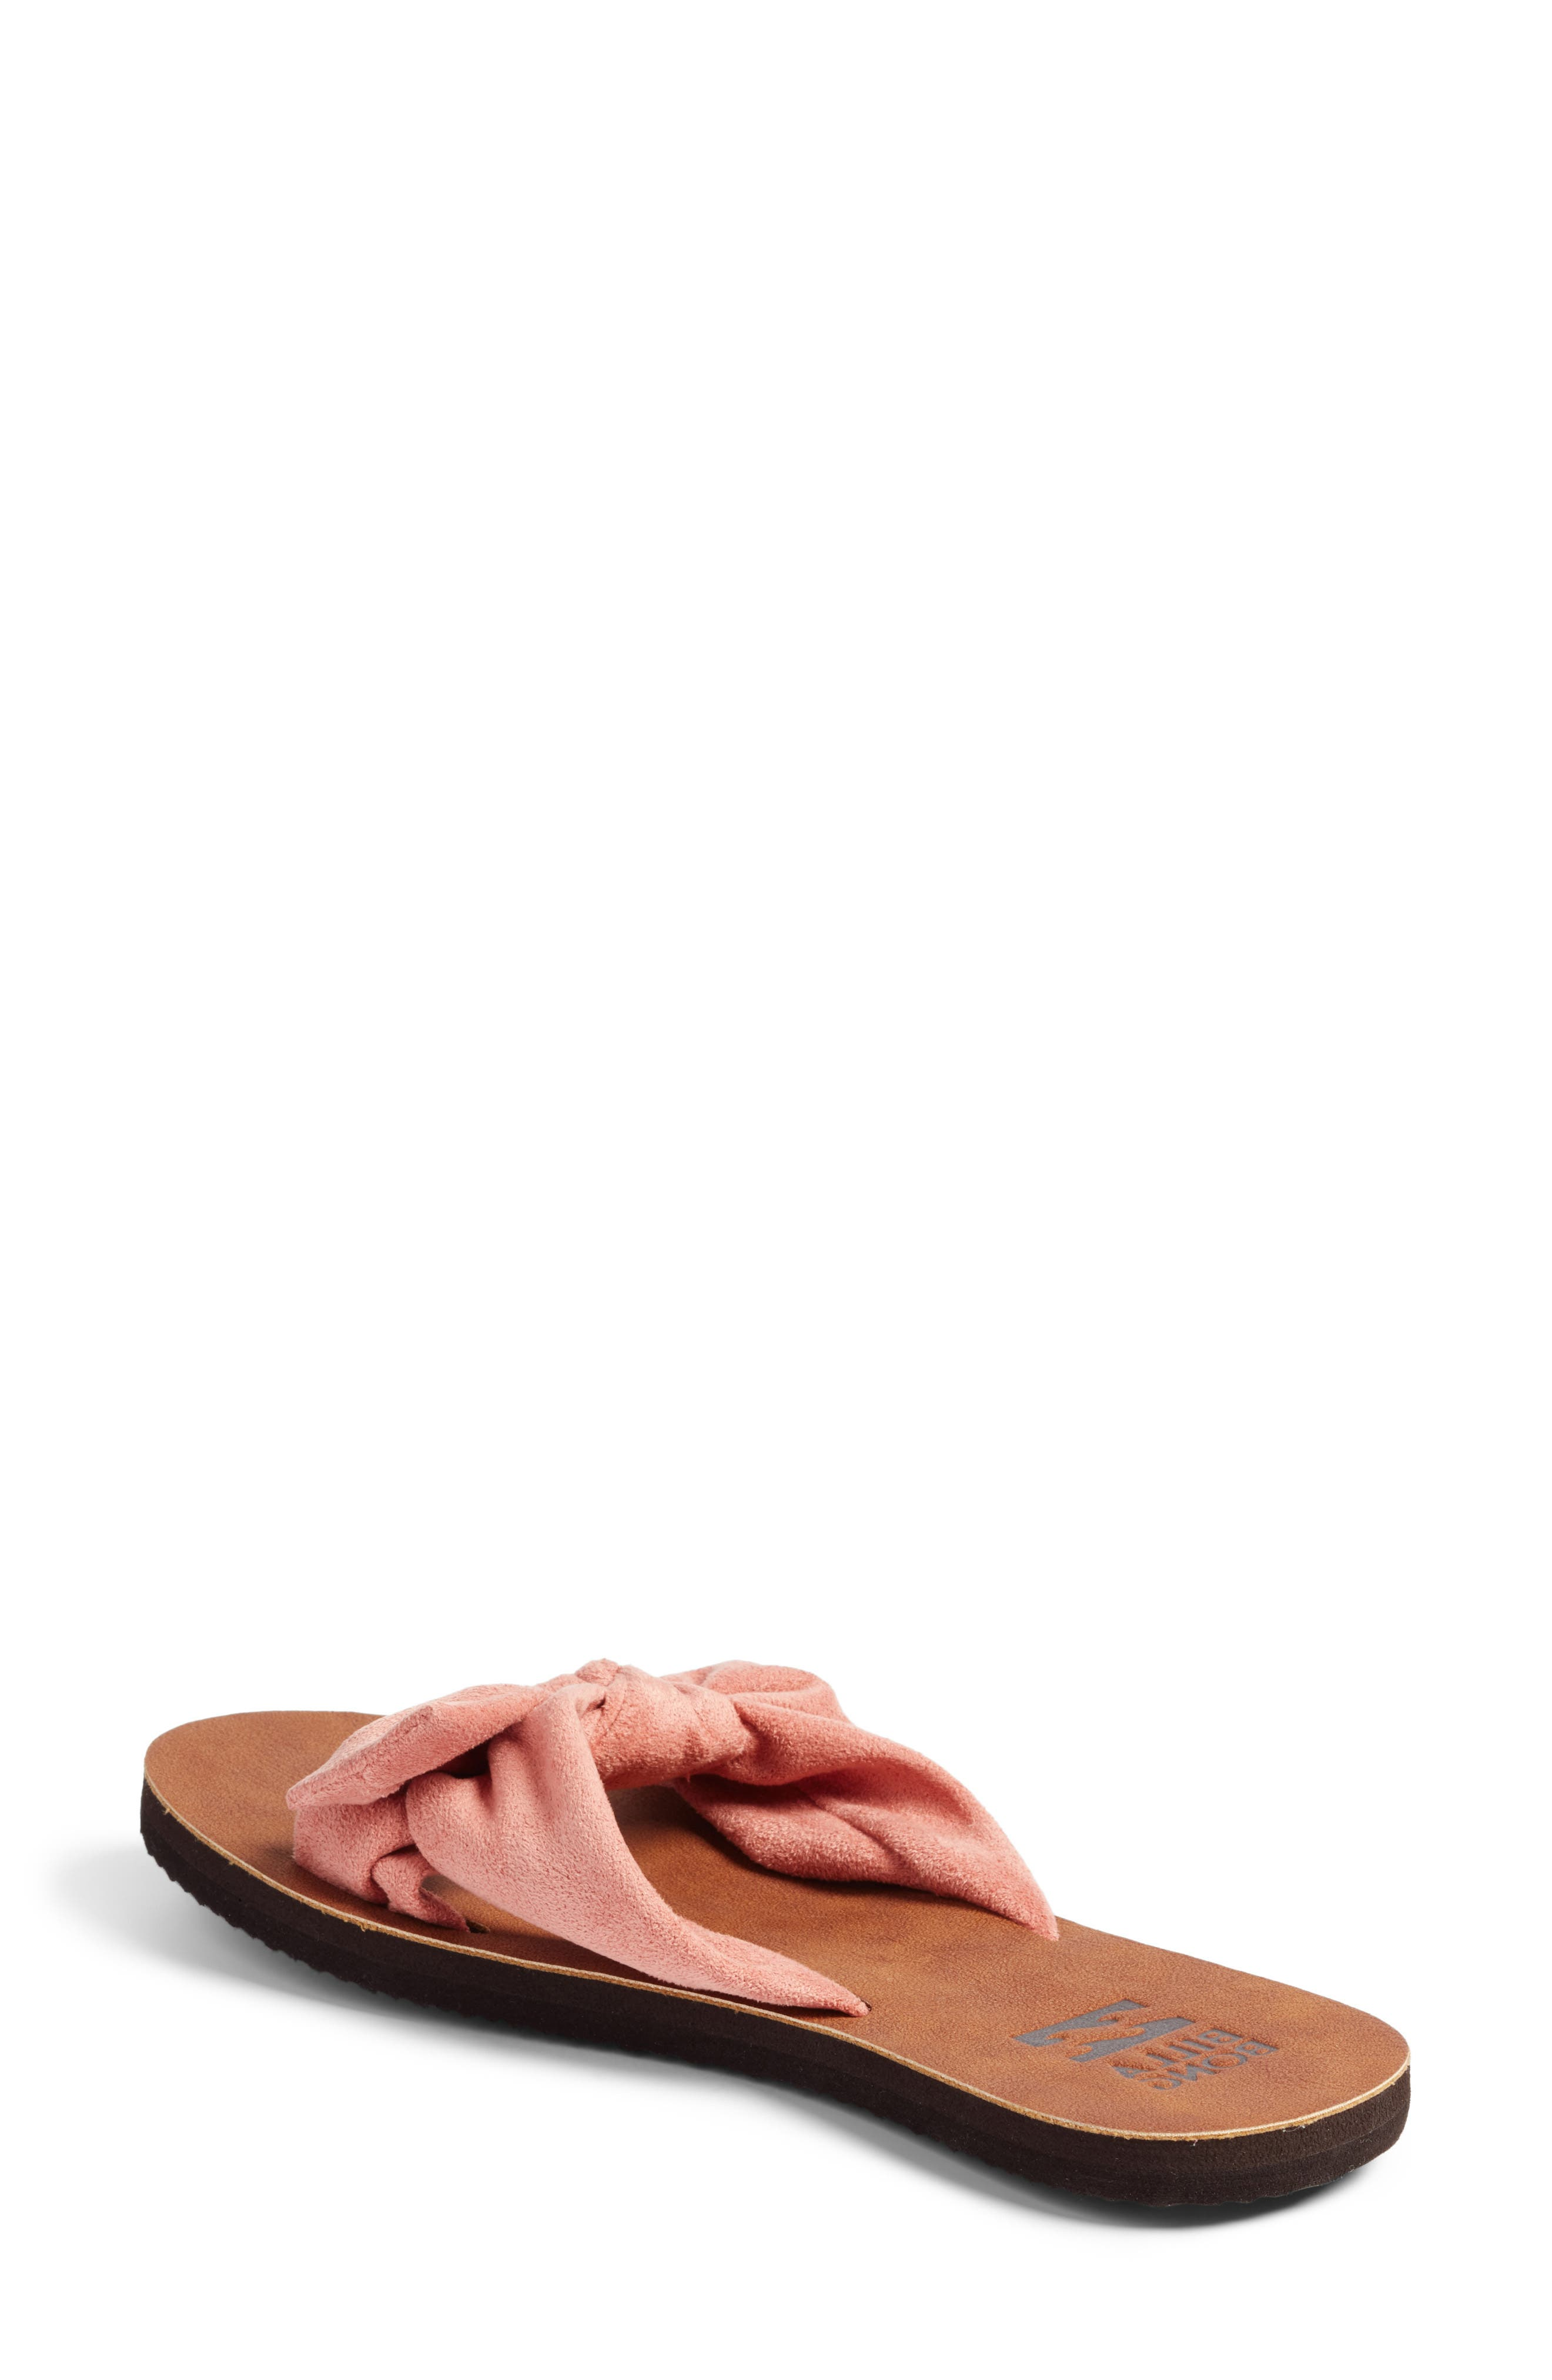 Tied-Up Slide Sandal,                             Alternate thumbnail 4, color,